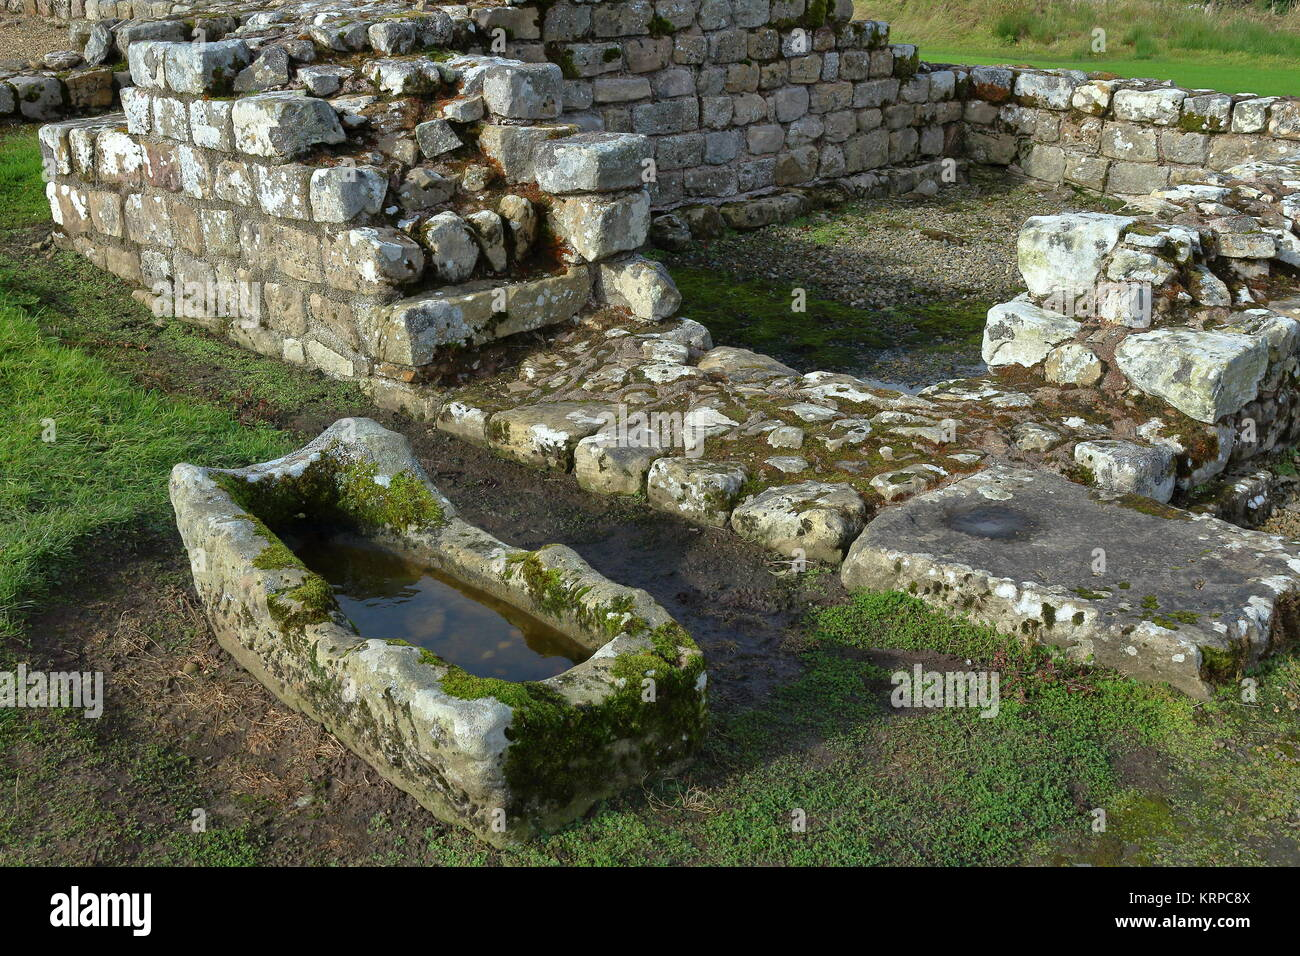 Roman stone trough and ruins at Vindolanda Roman fort, next to Hadrian's Wall, Northumberland. UK. 2017. - Stock Image